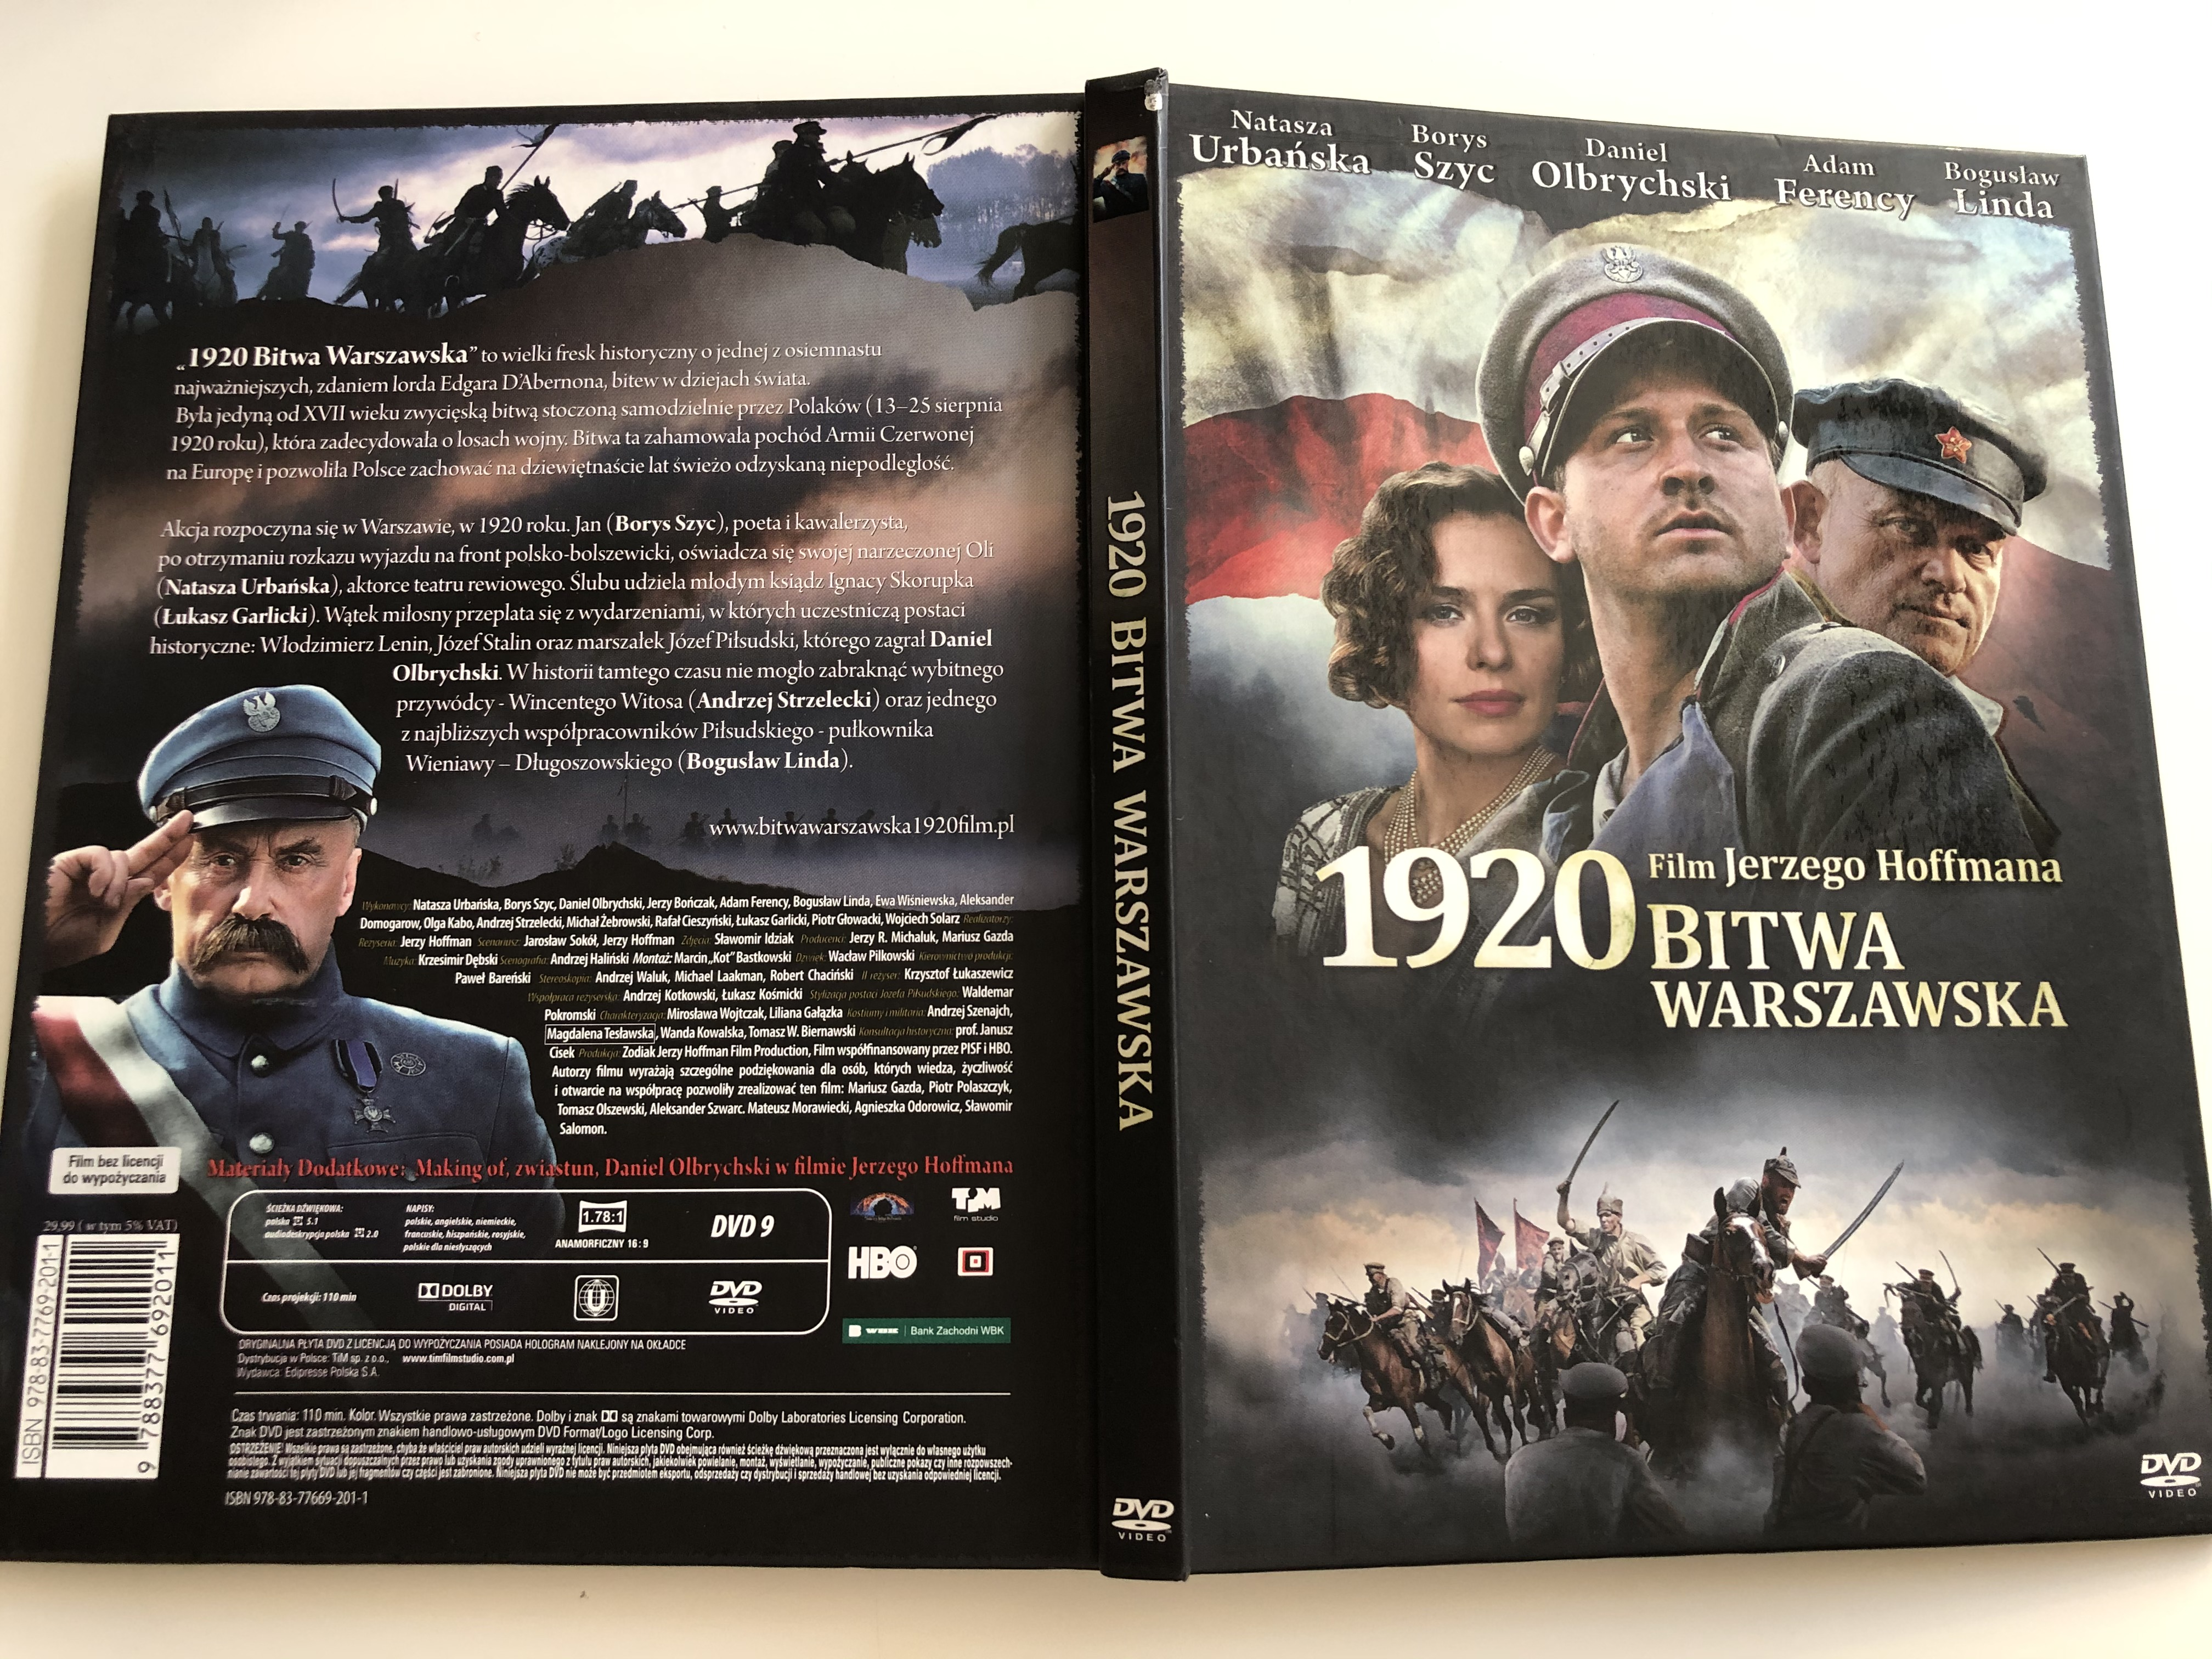 1920-bitwa-warszawska-dvd-2011-warsaw-battle-directed-by-jerzy-hoffman-14-.jpg